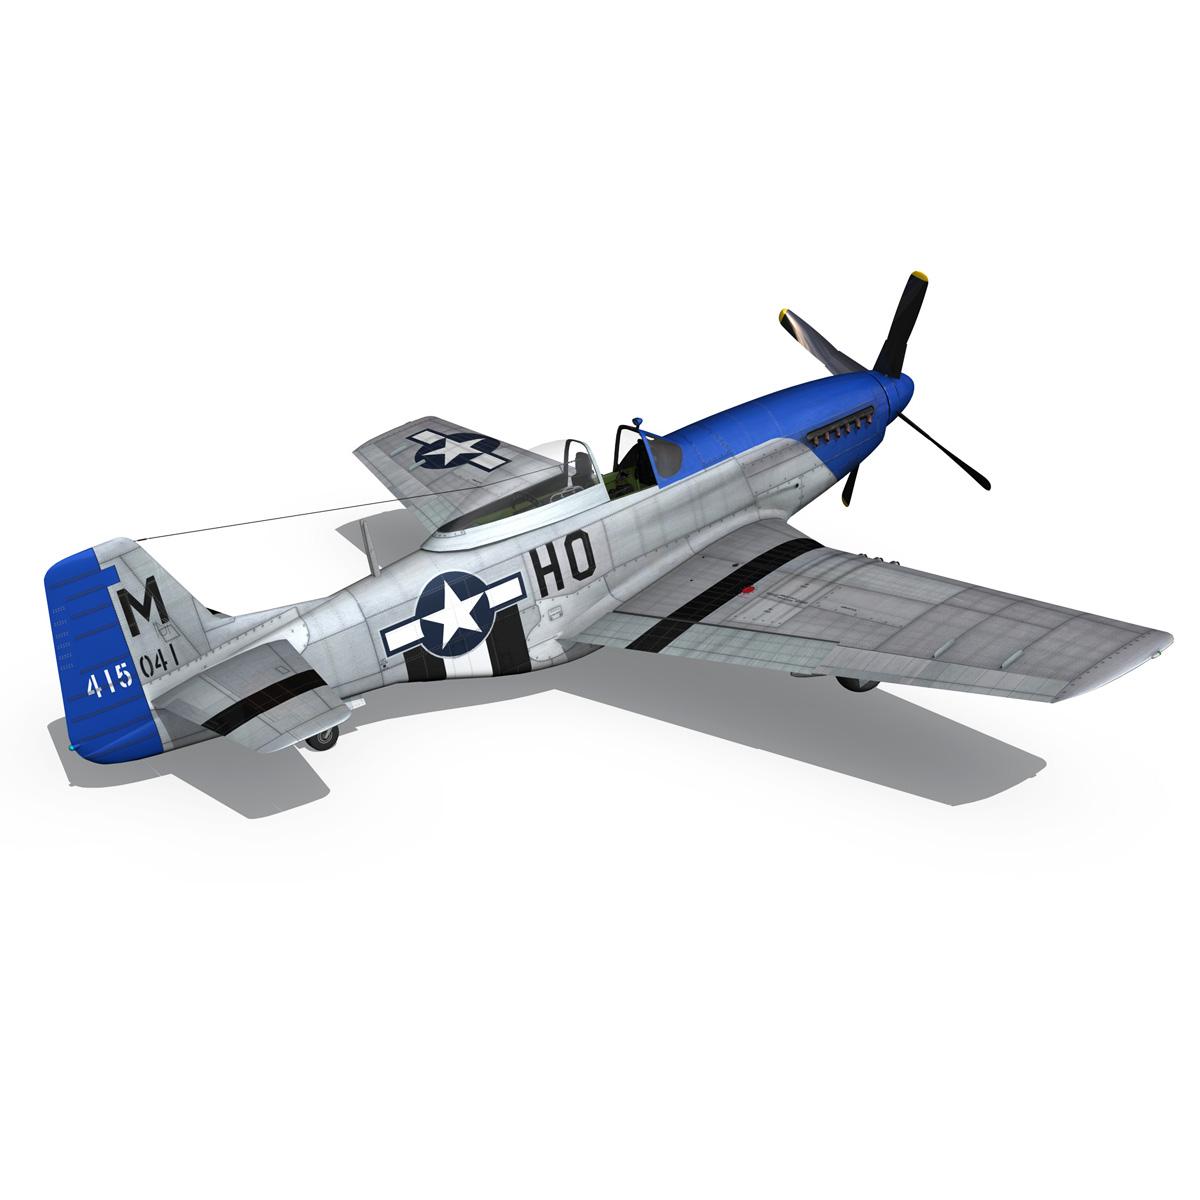 north american p-51d mustang – petie 3rd 3d model fbx c4d lwo obj 280140